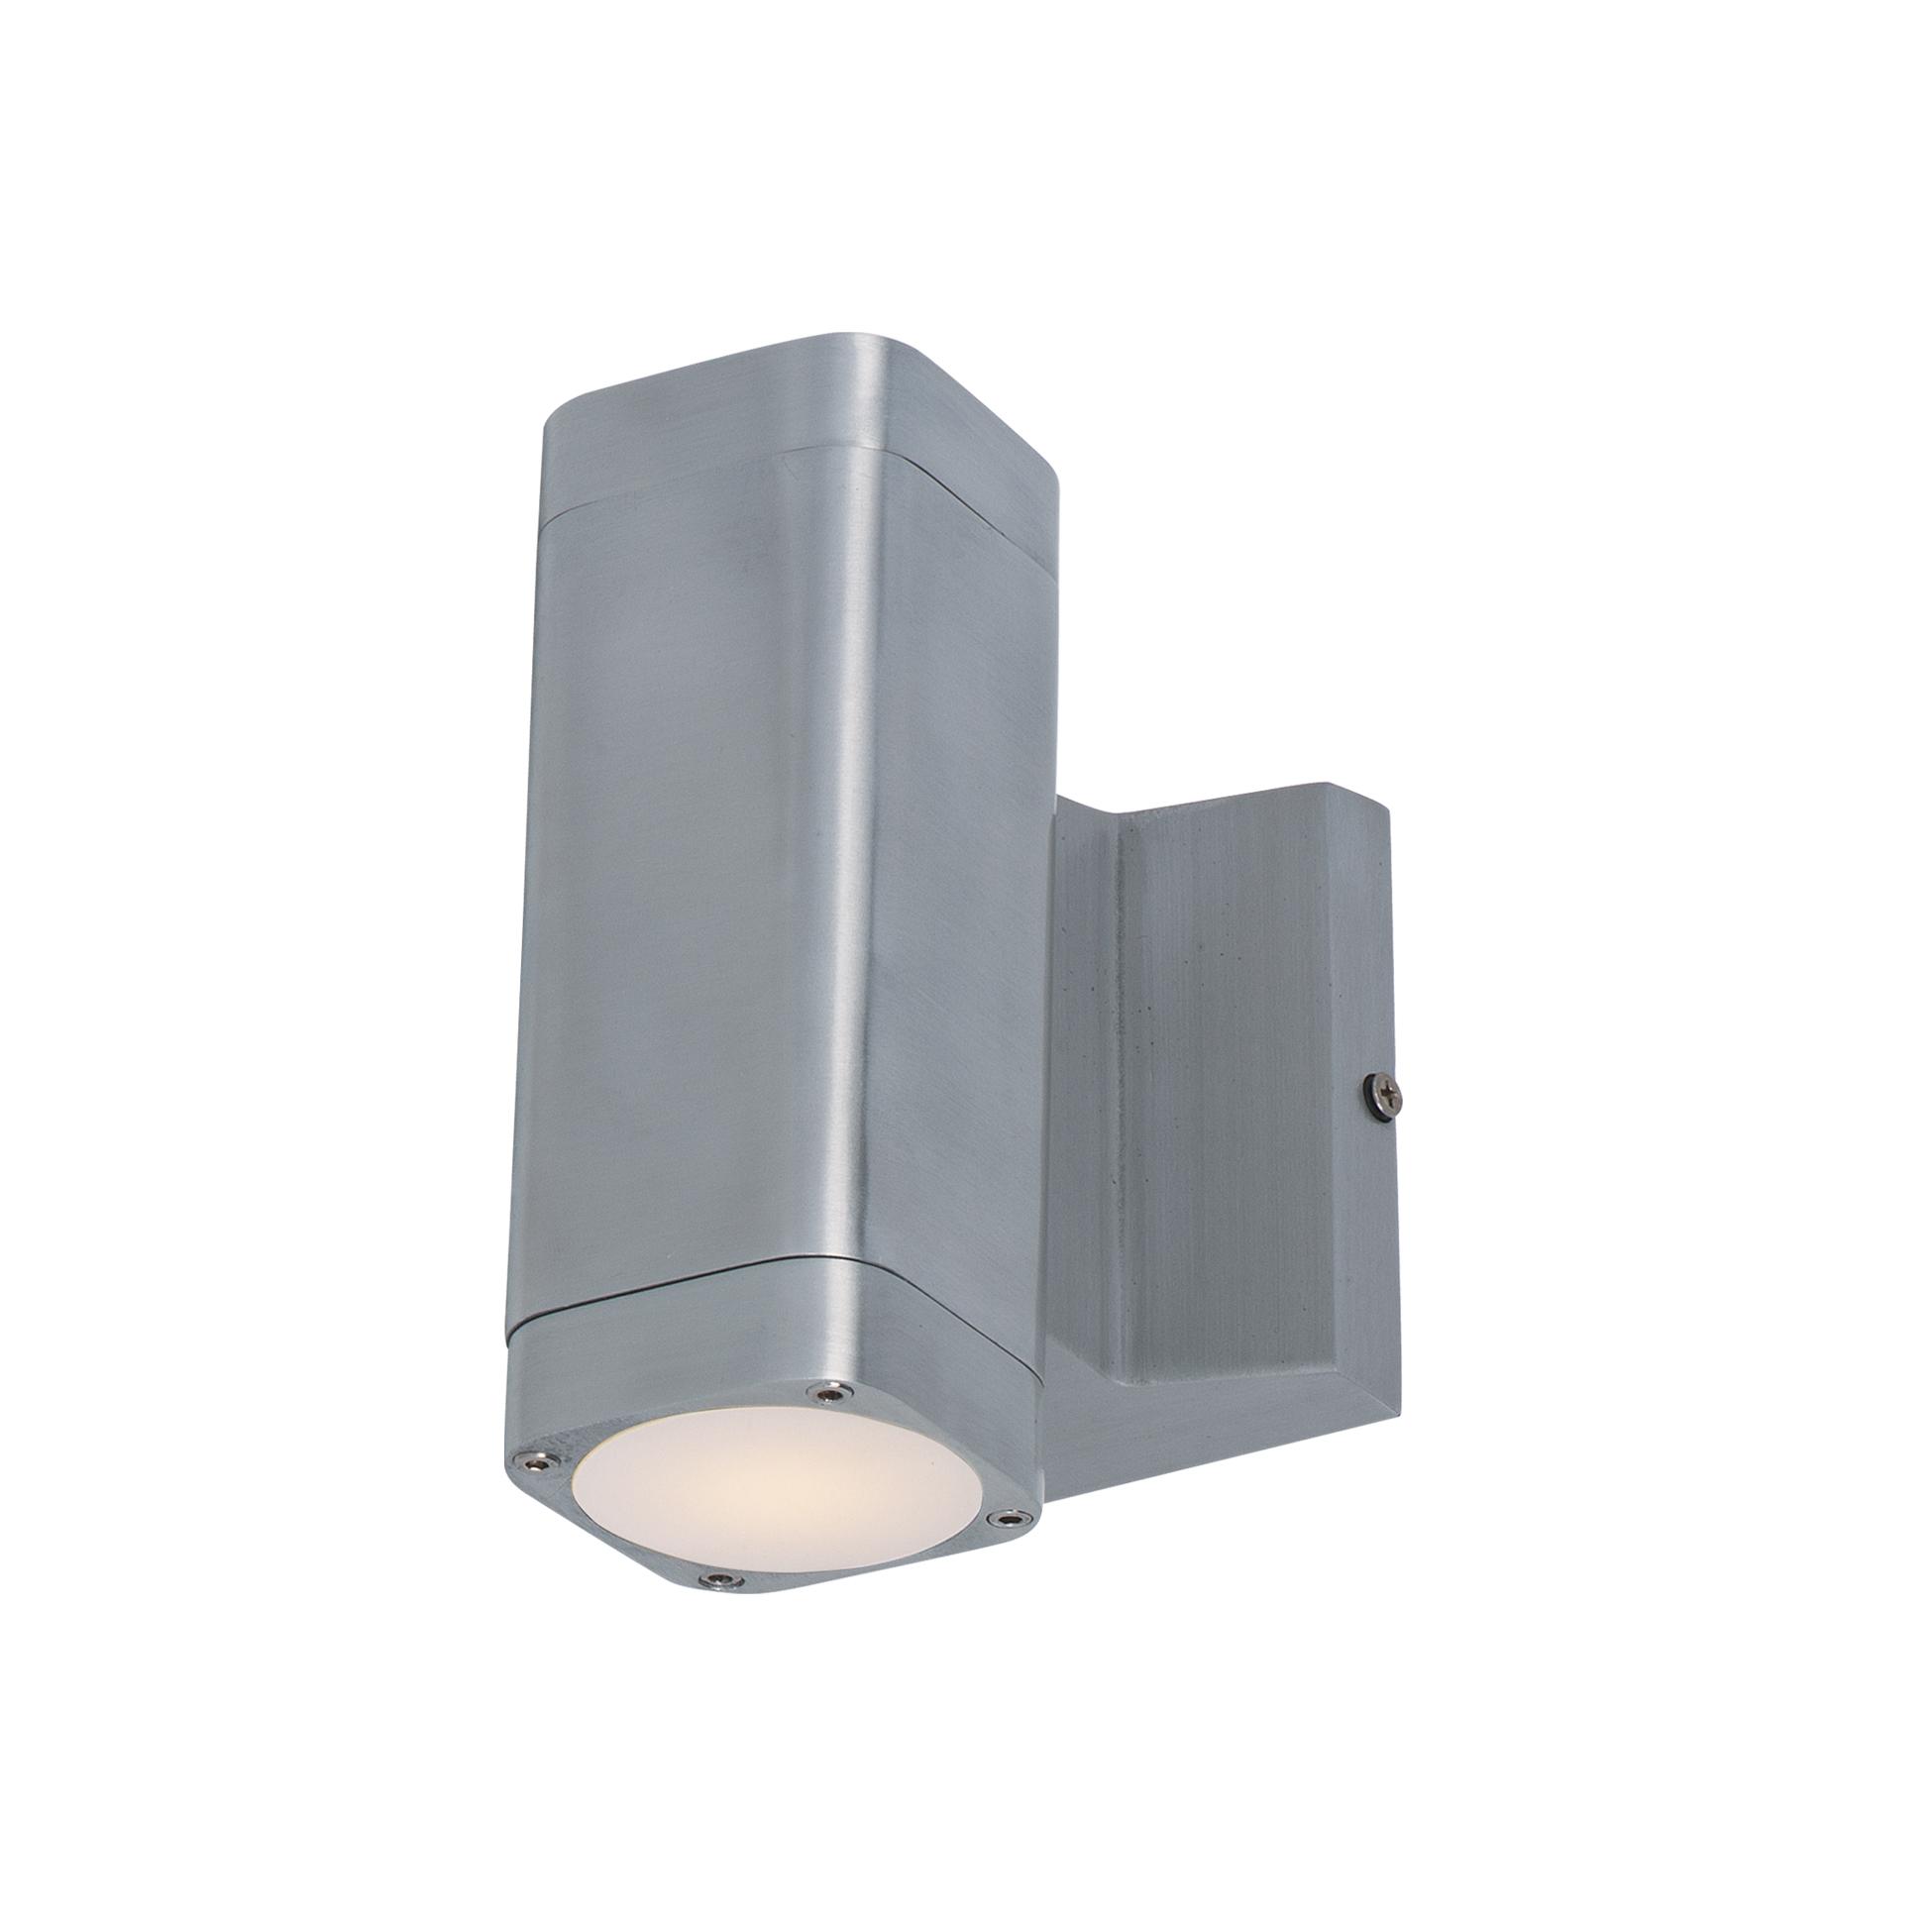 Lightray LED 2-Light Wall Sconce   Maxim Lighting